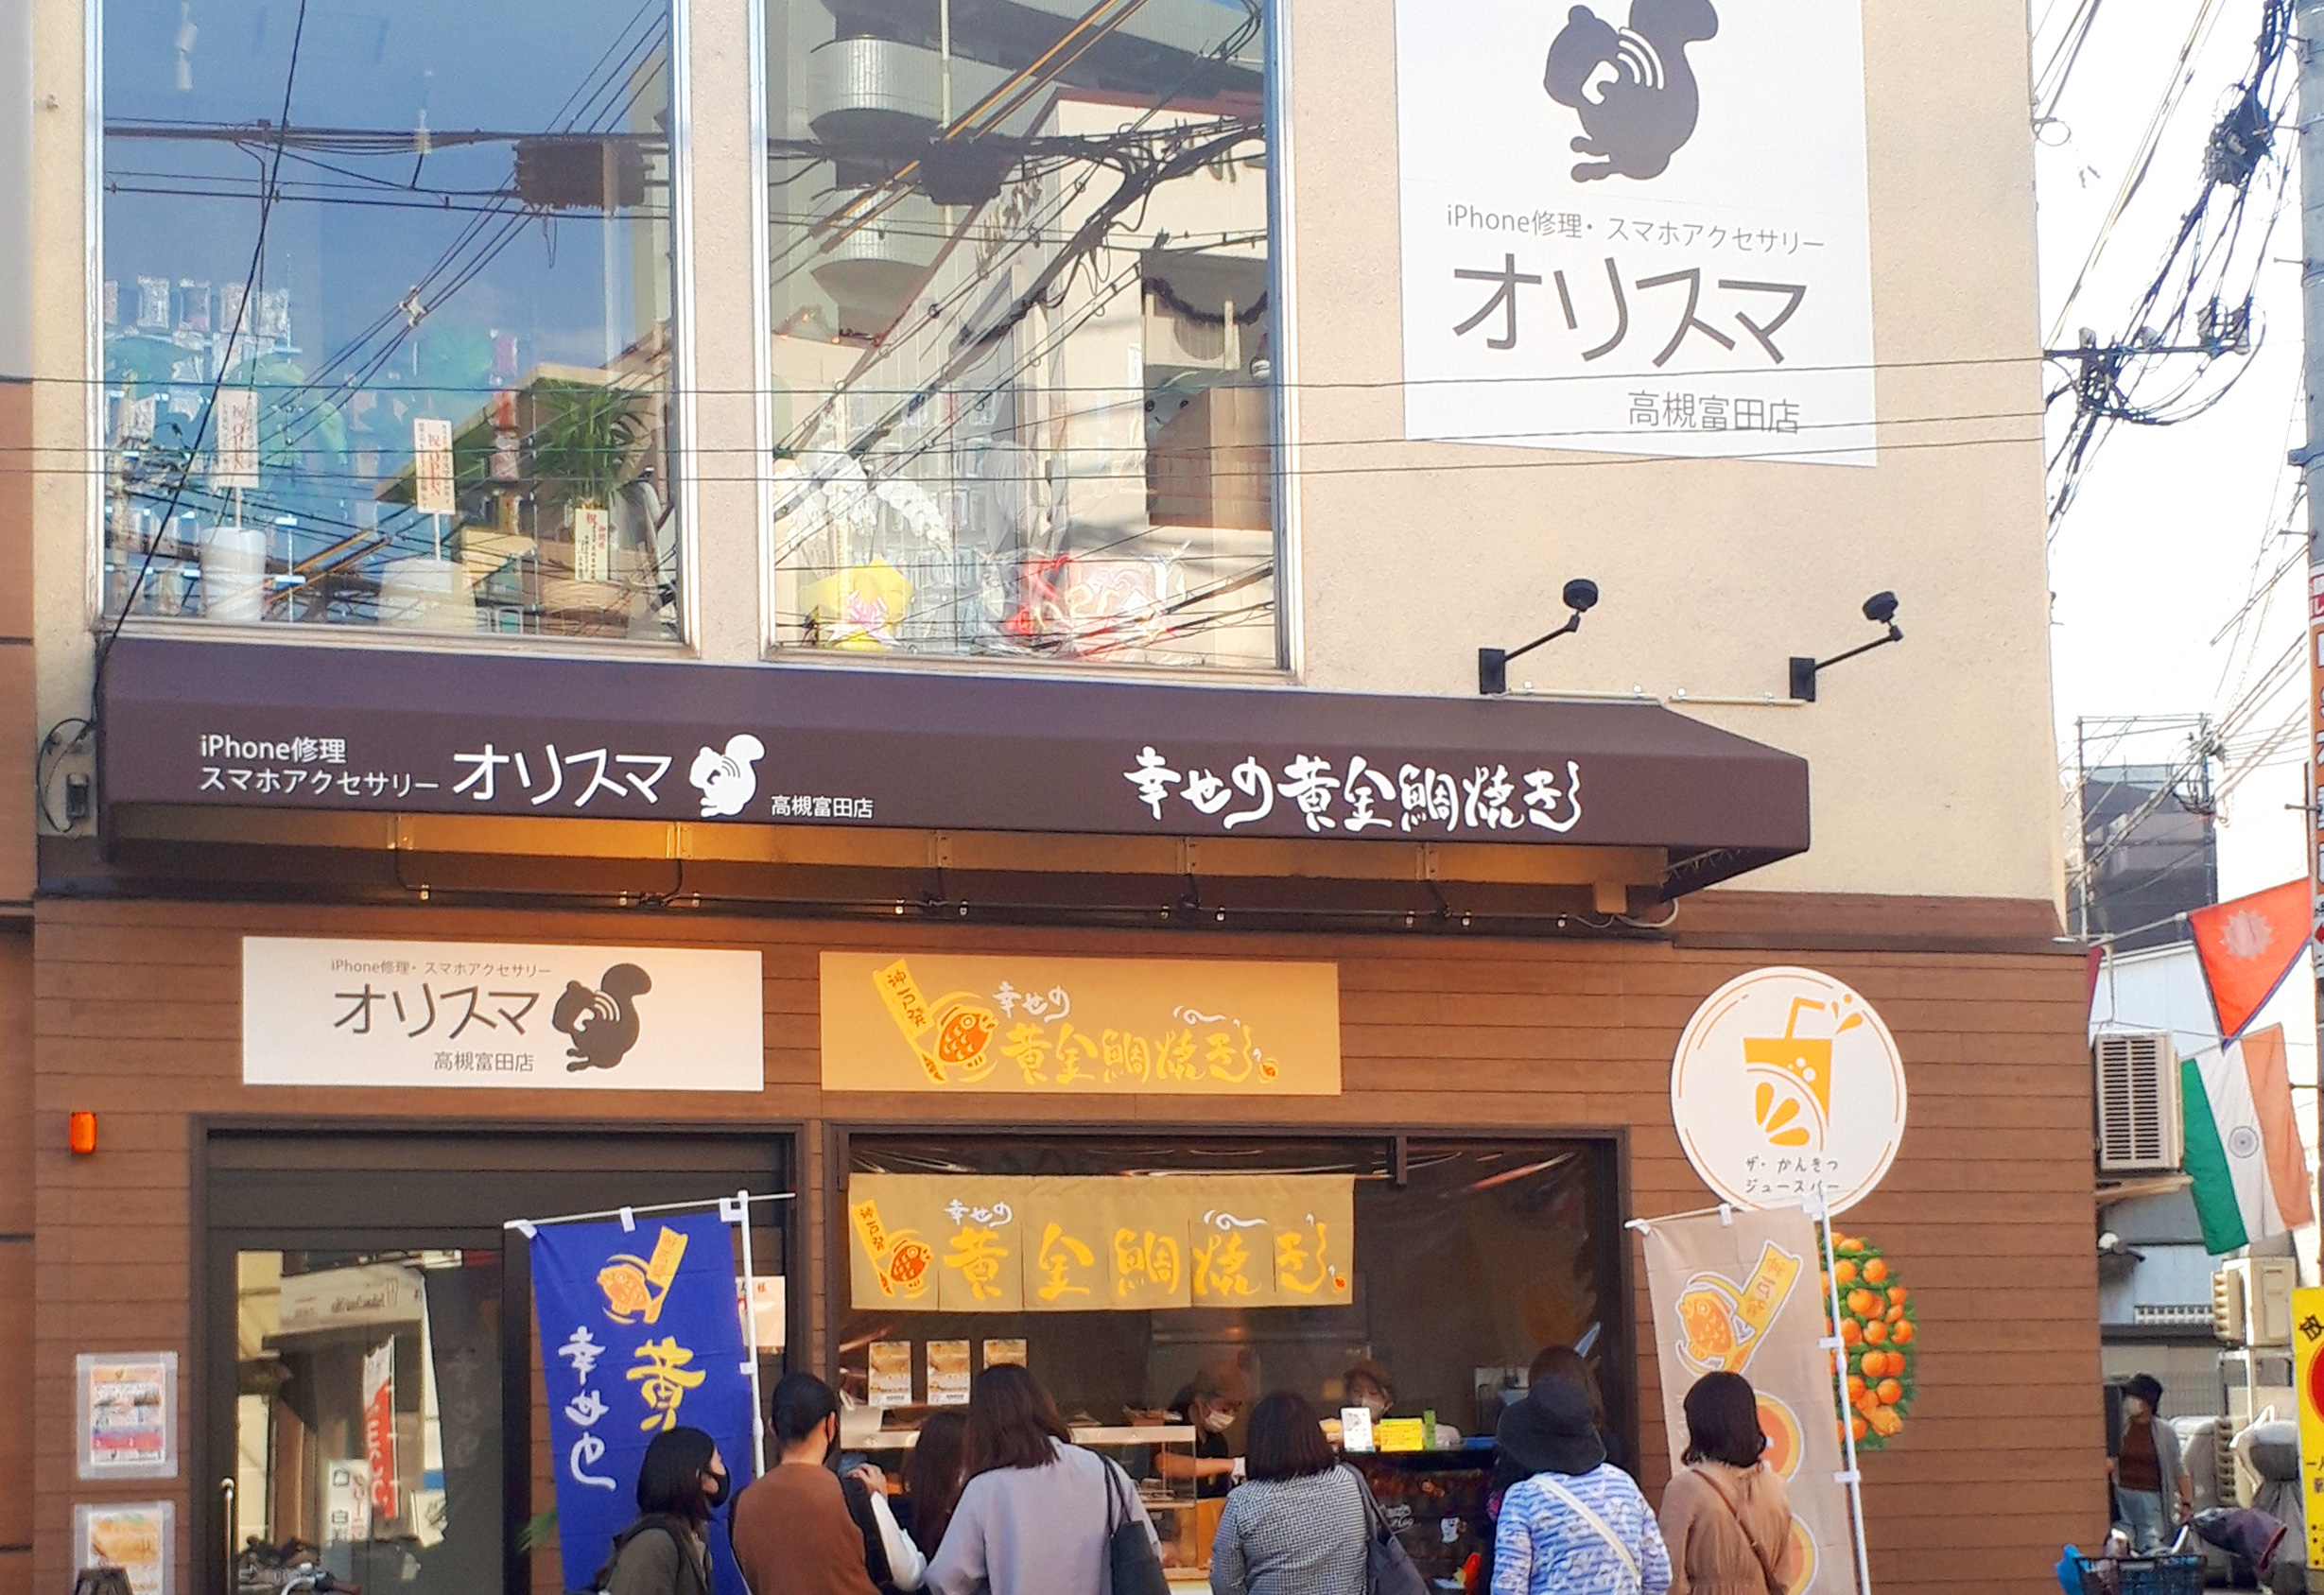 orisma-kusatsu-image